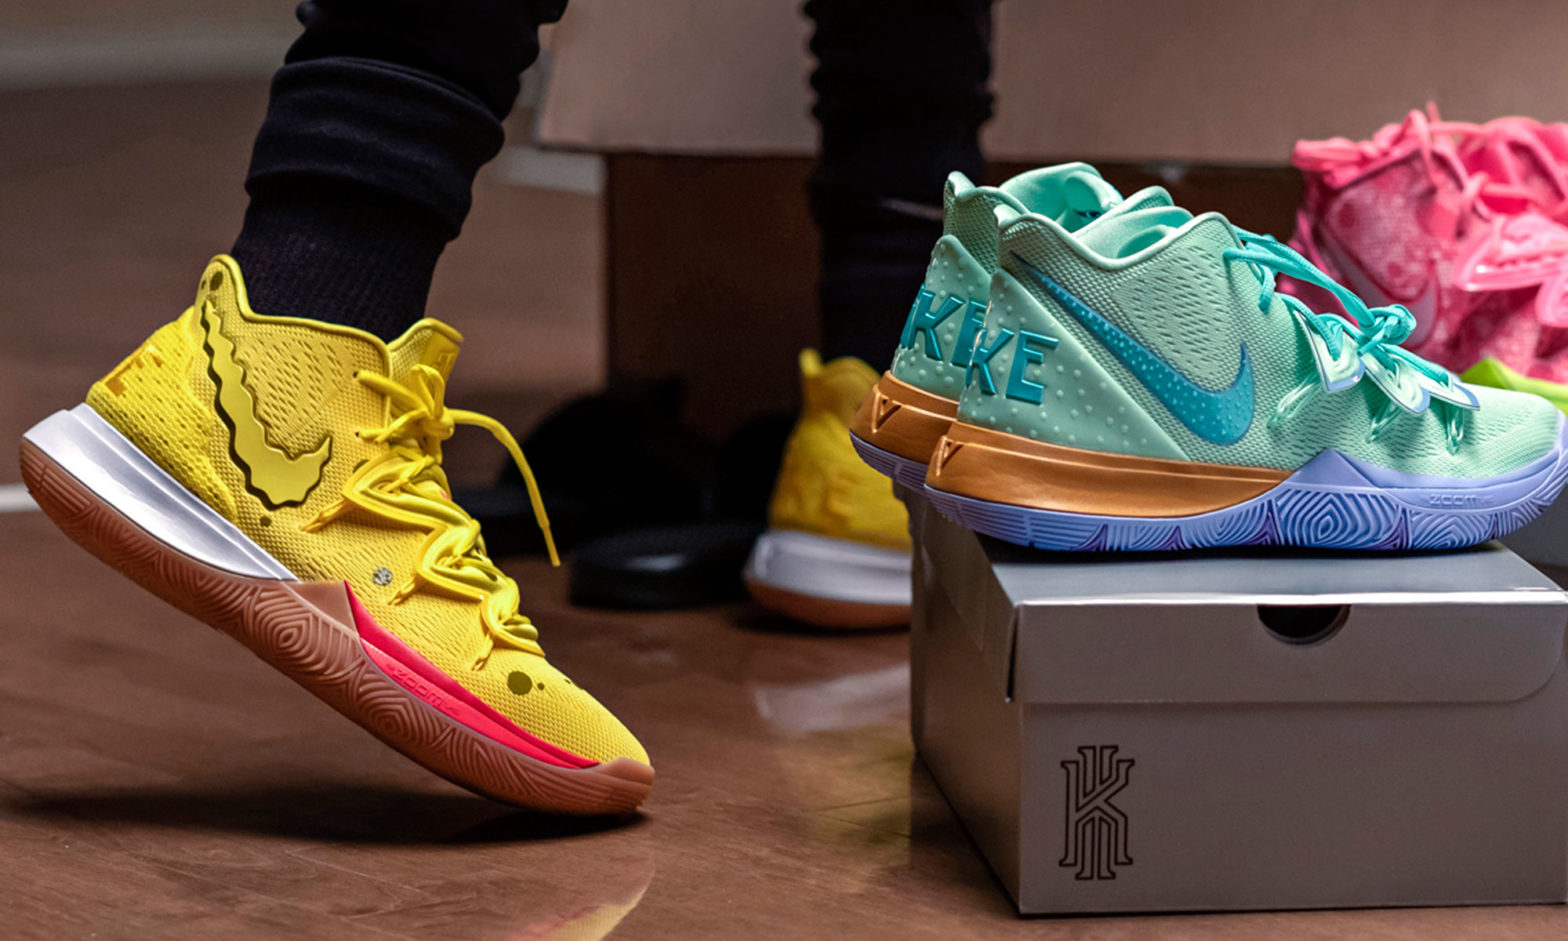 Nike x Spongebob Squarepants Kyrie Sneaker